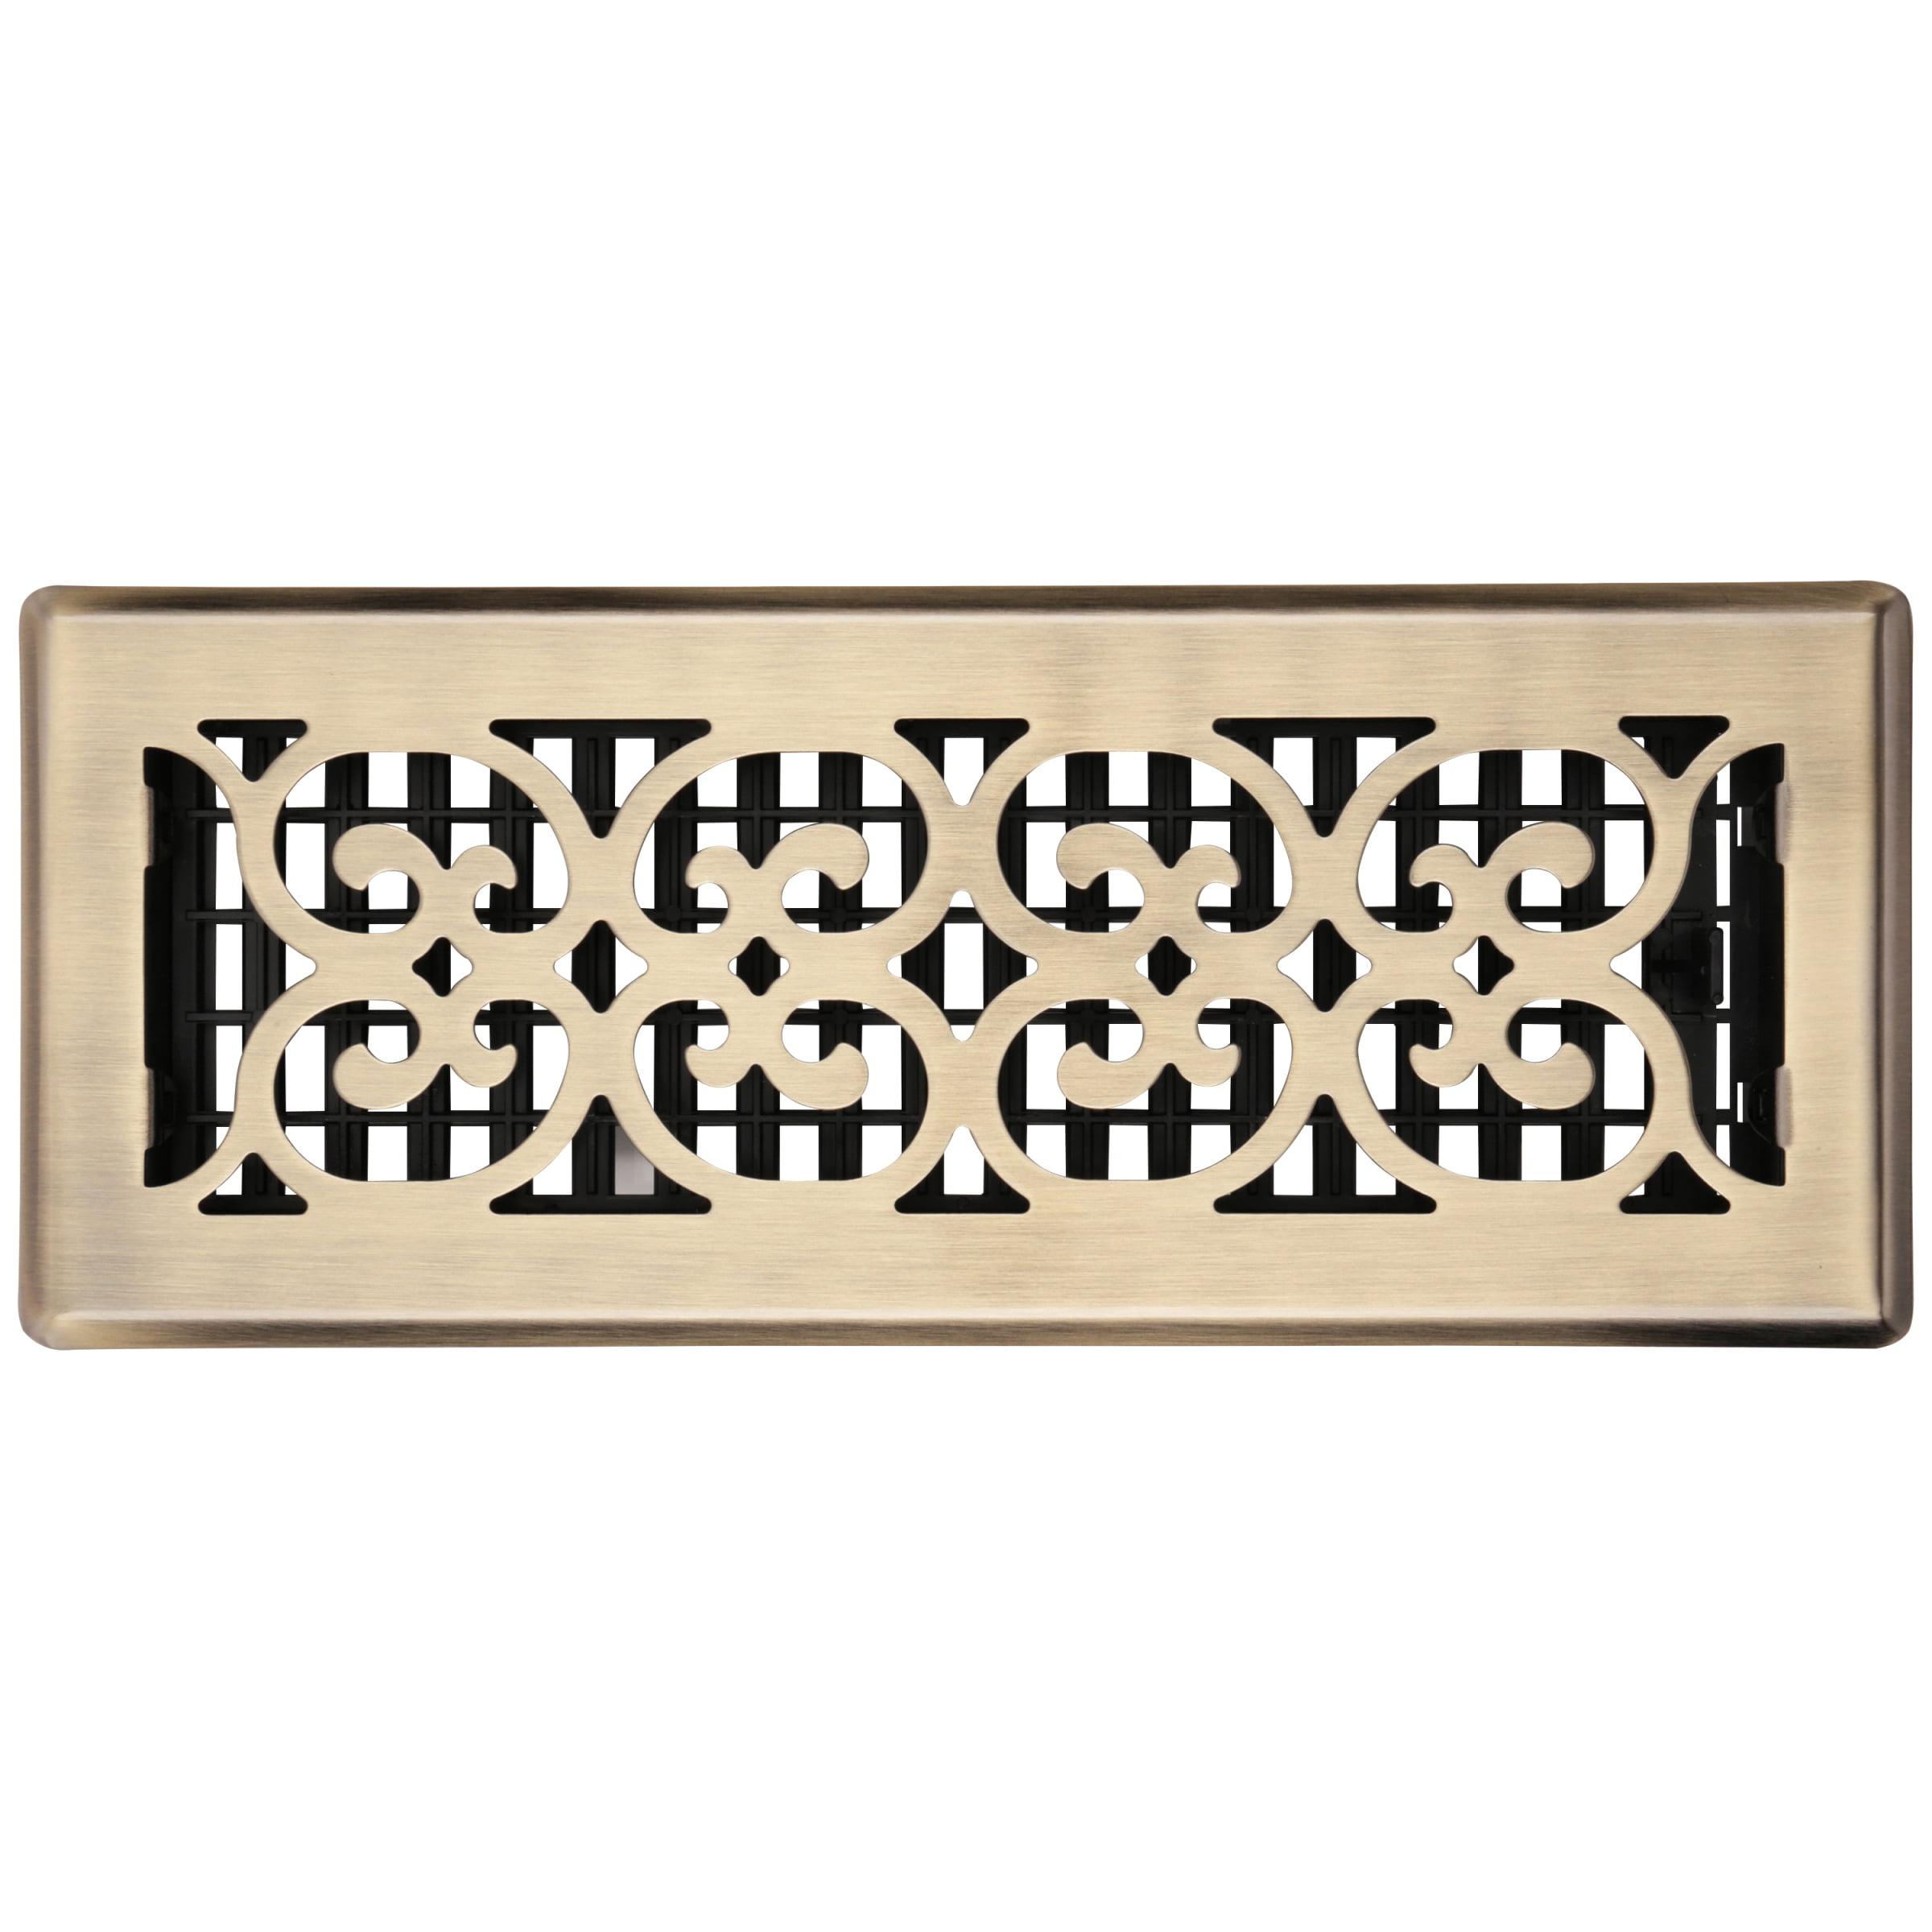 "Decor Grates® 4""x12"" Scroll™ Steel Plated Antique Floor Register Pack"